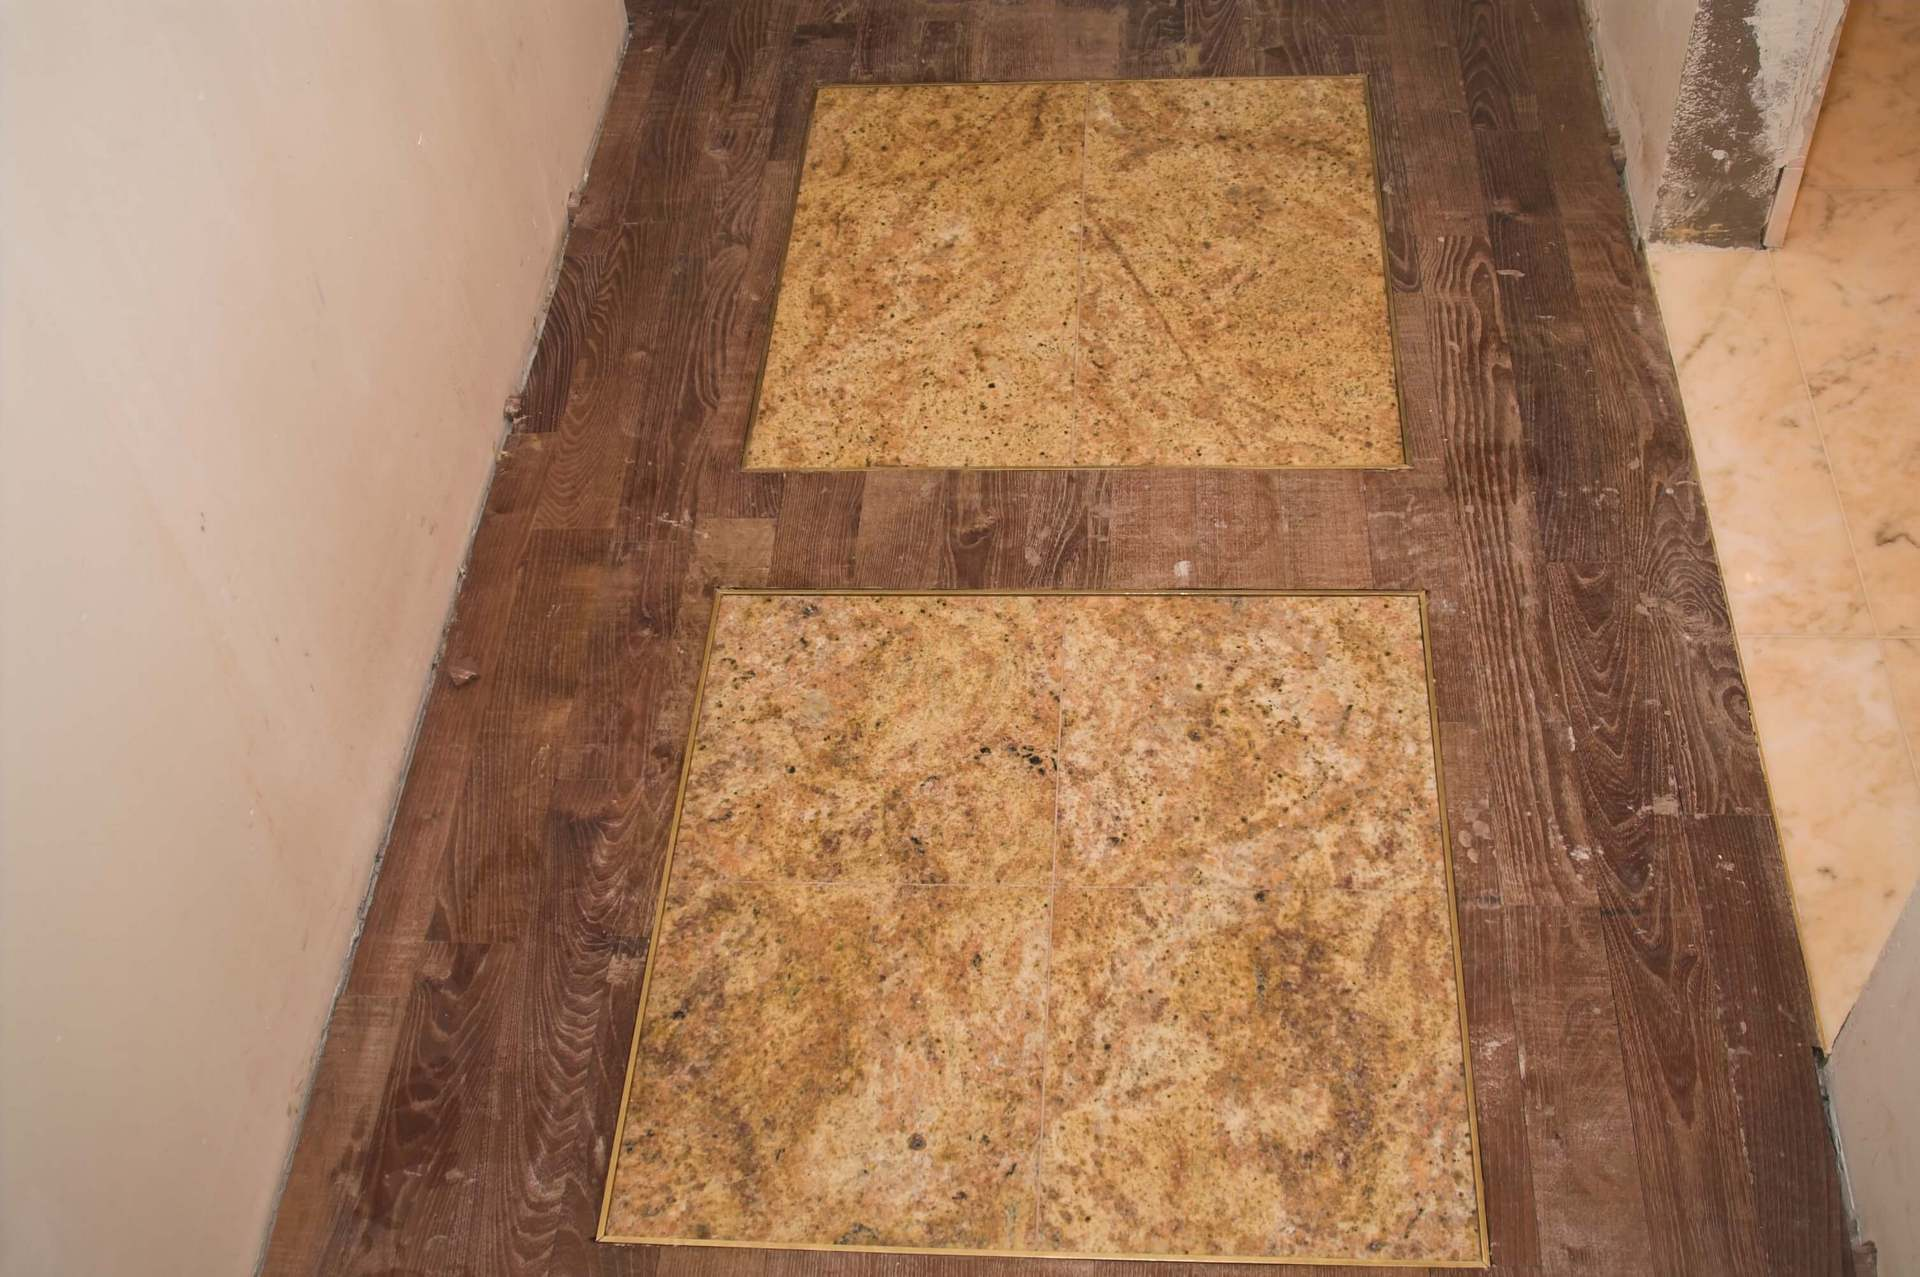 podłoga granitowa